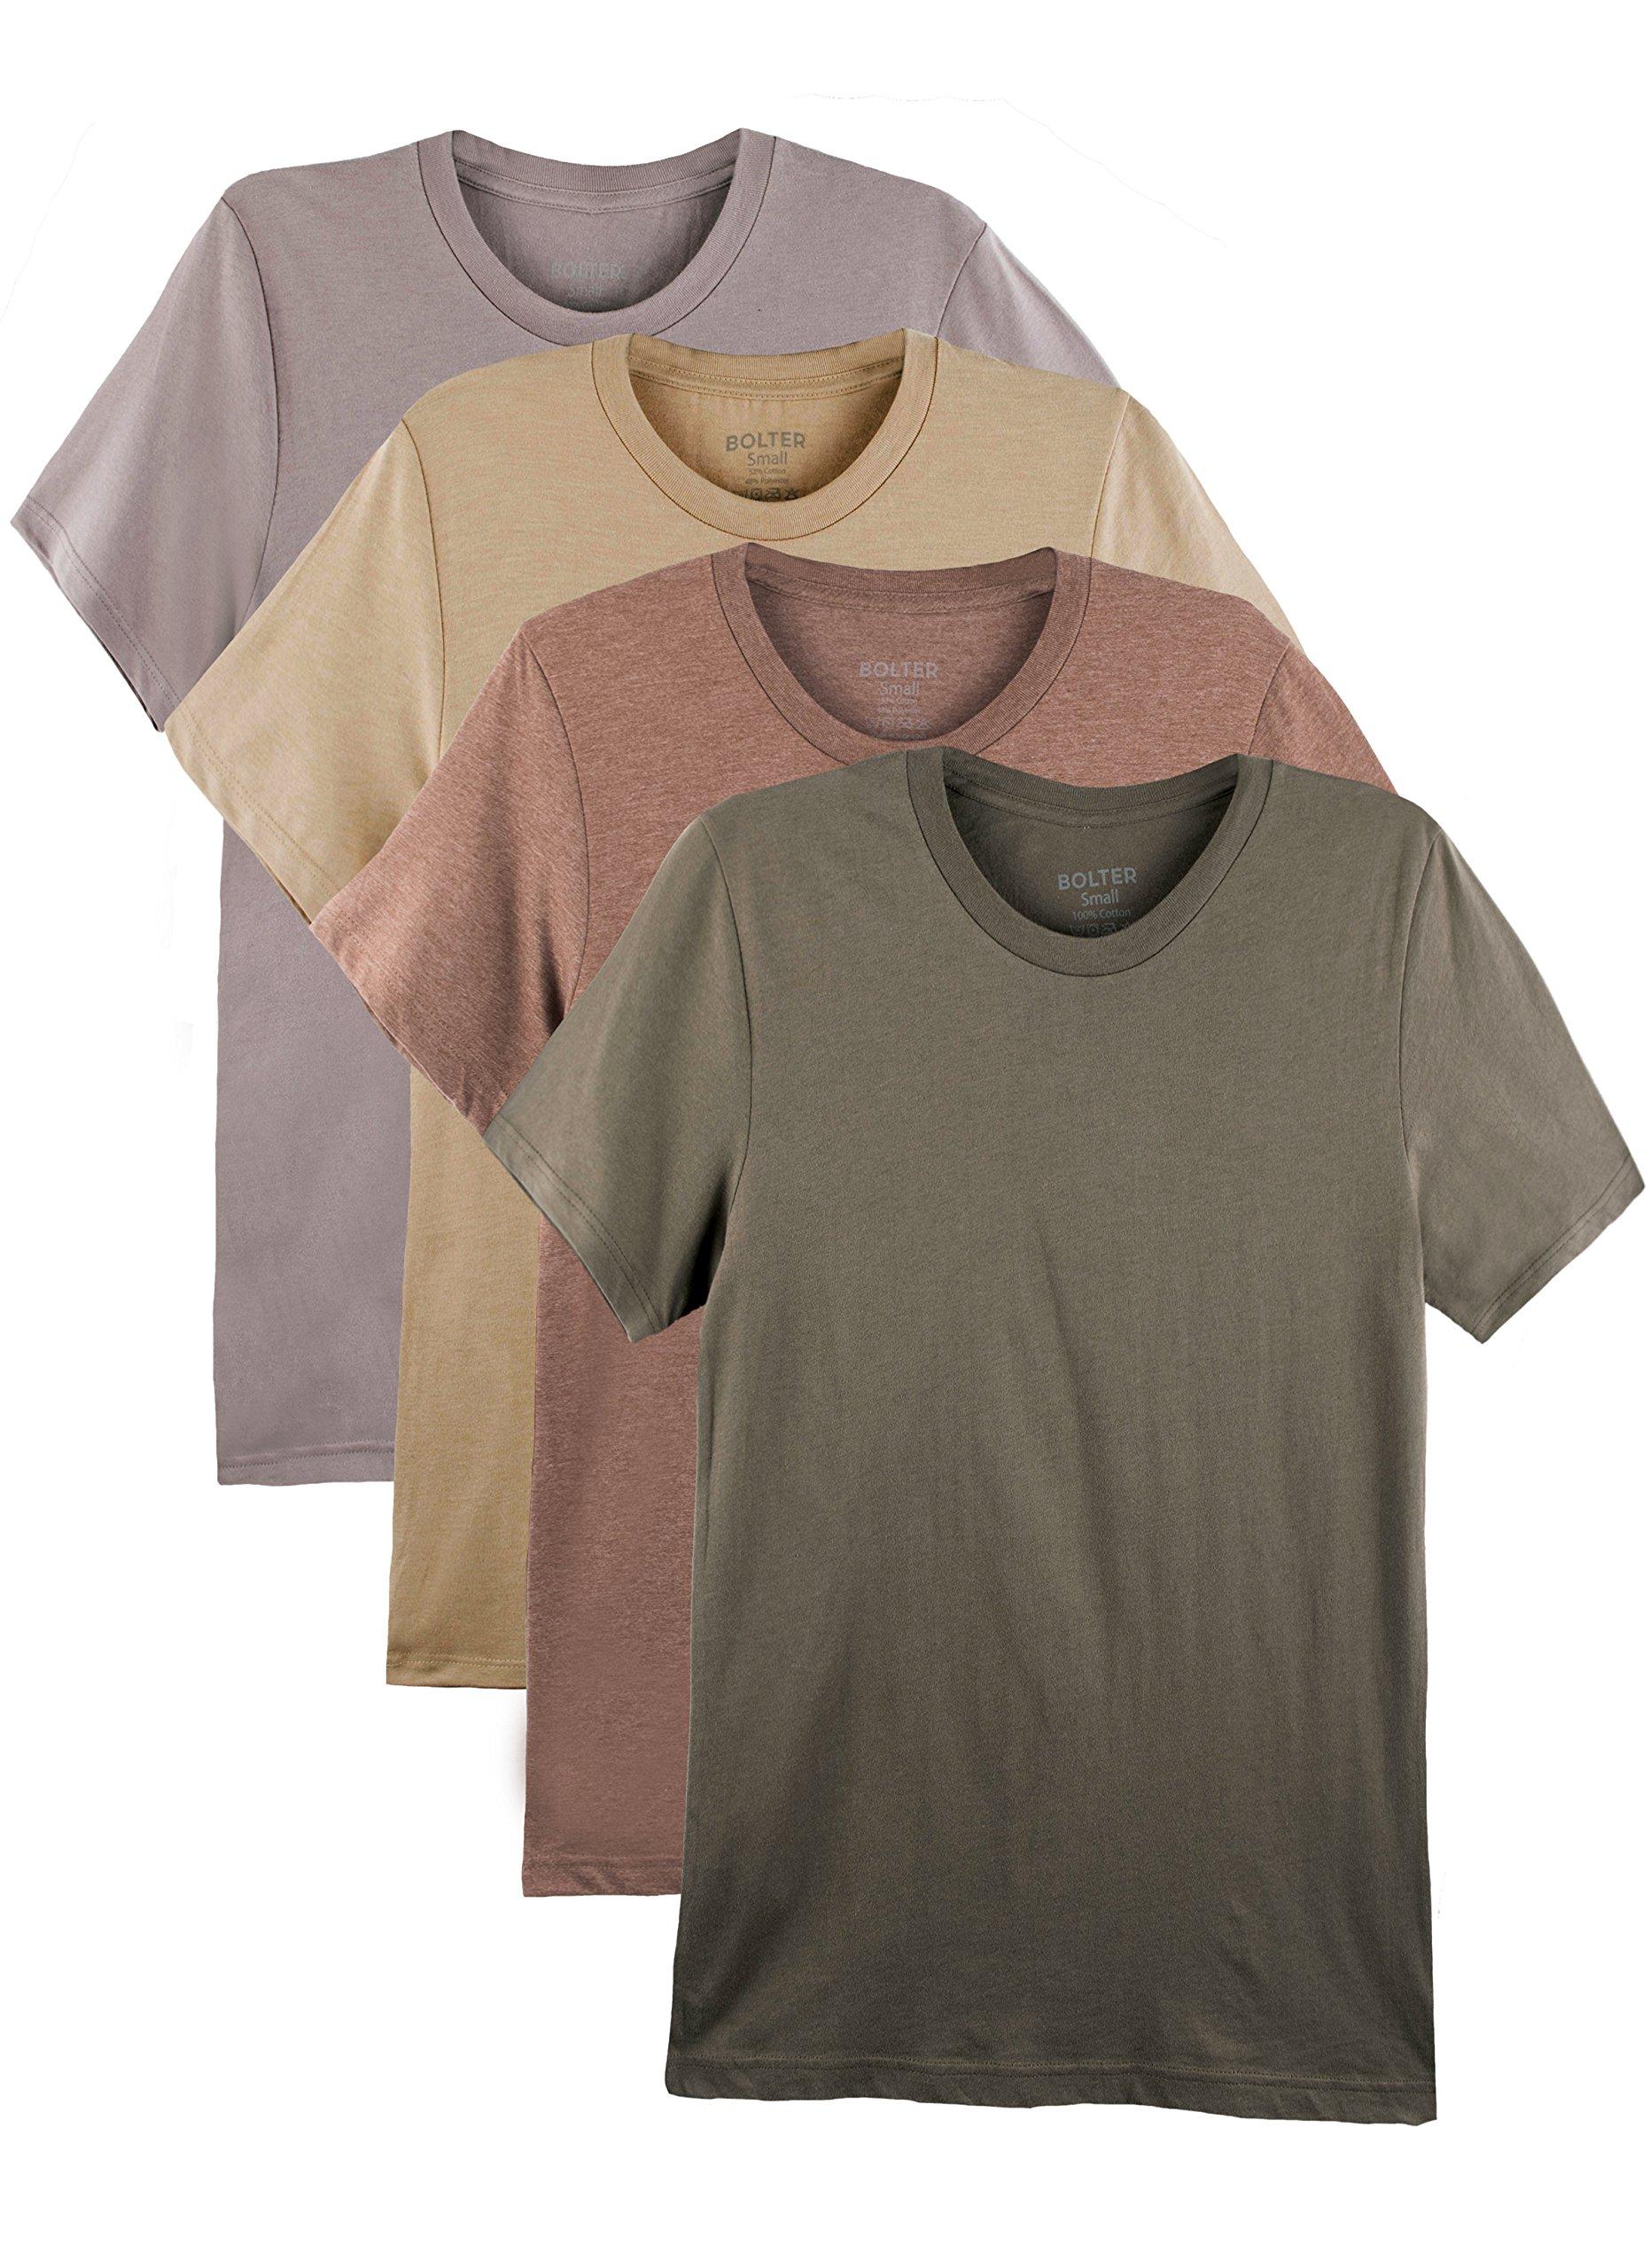 Bolter 4 Pack Men's Everyday Cotton Blend Short Sleeve T-Shirts (Medium, Earth Tones)